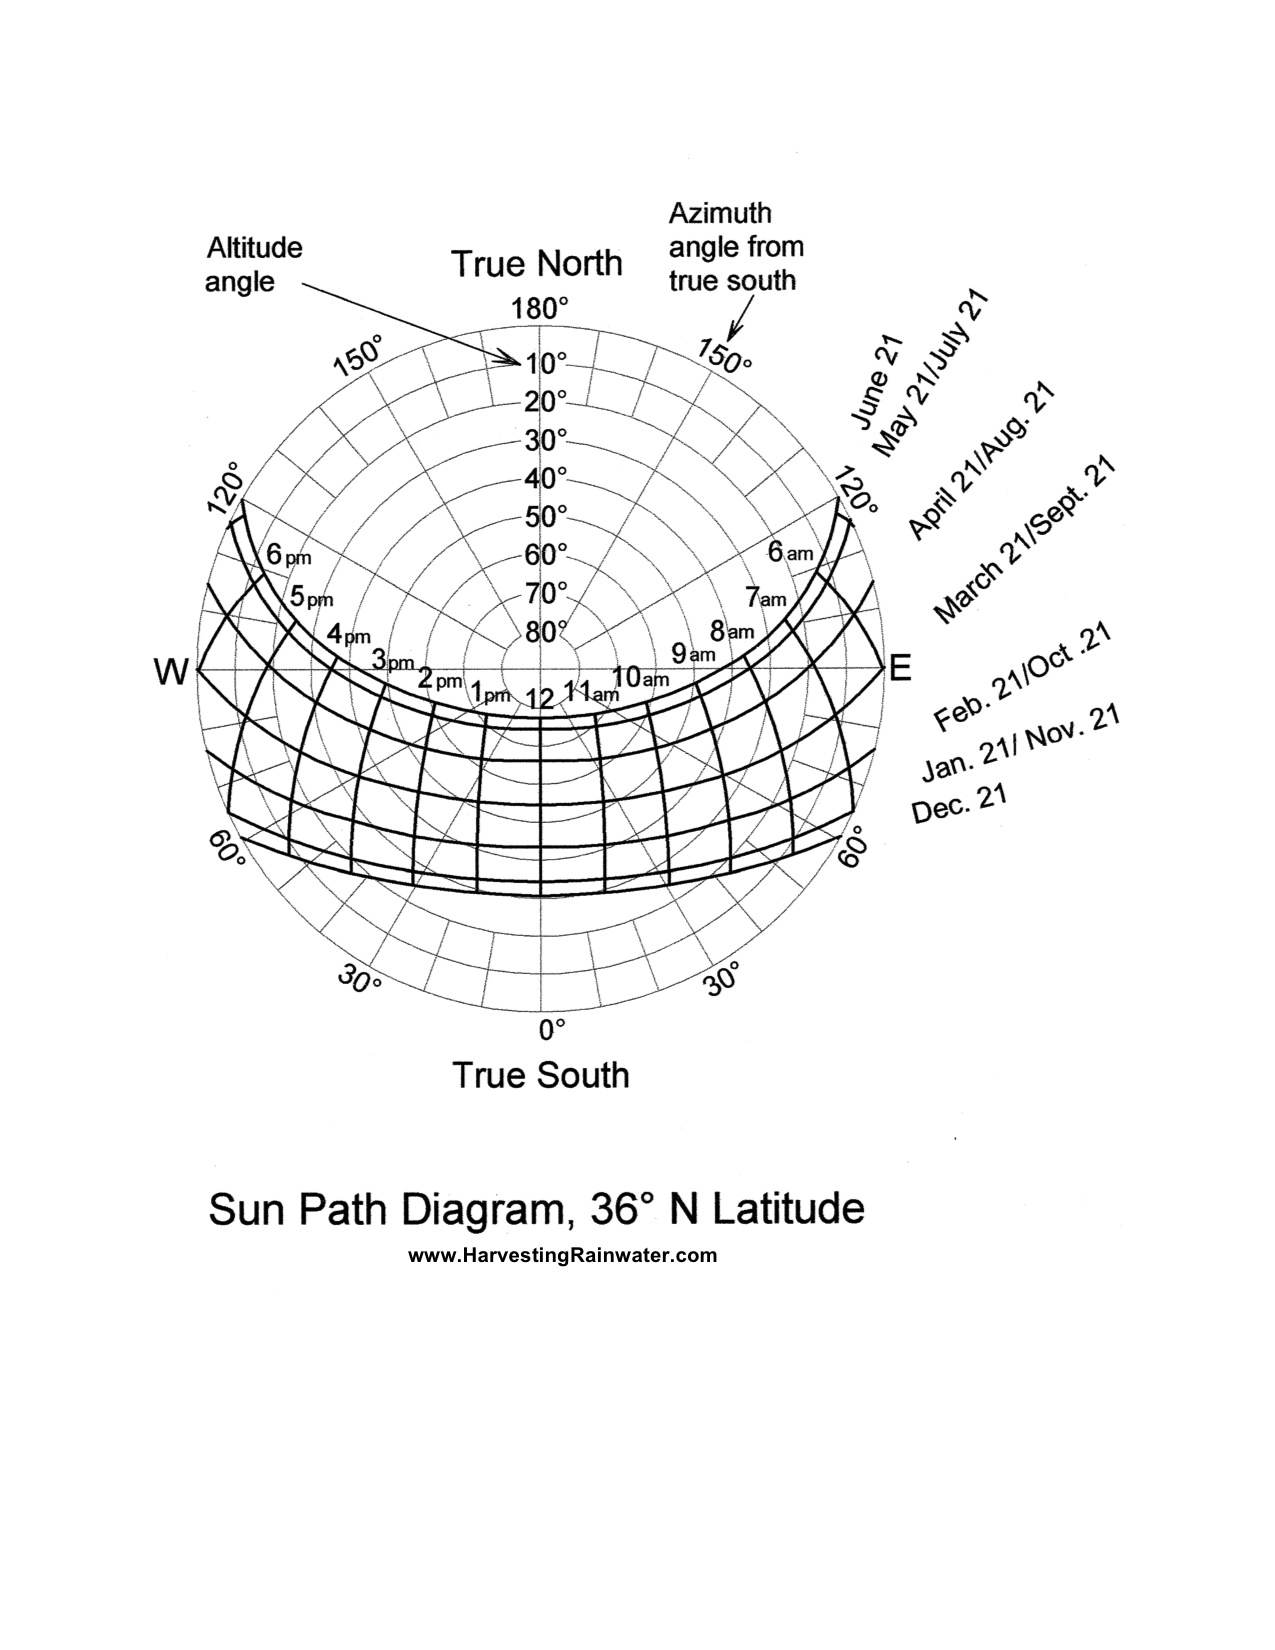 Sun Path Diagram 36o N Latitude